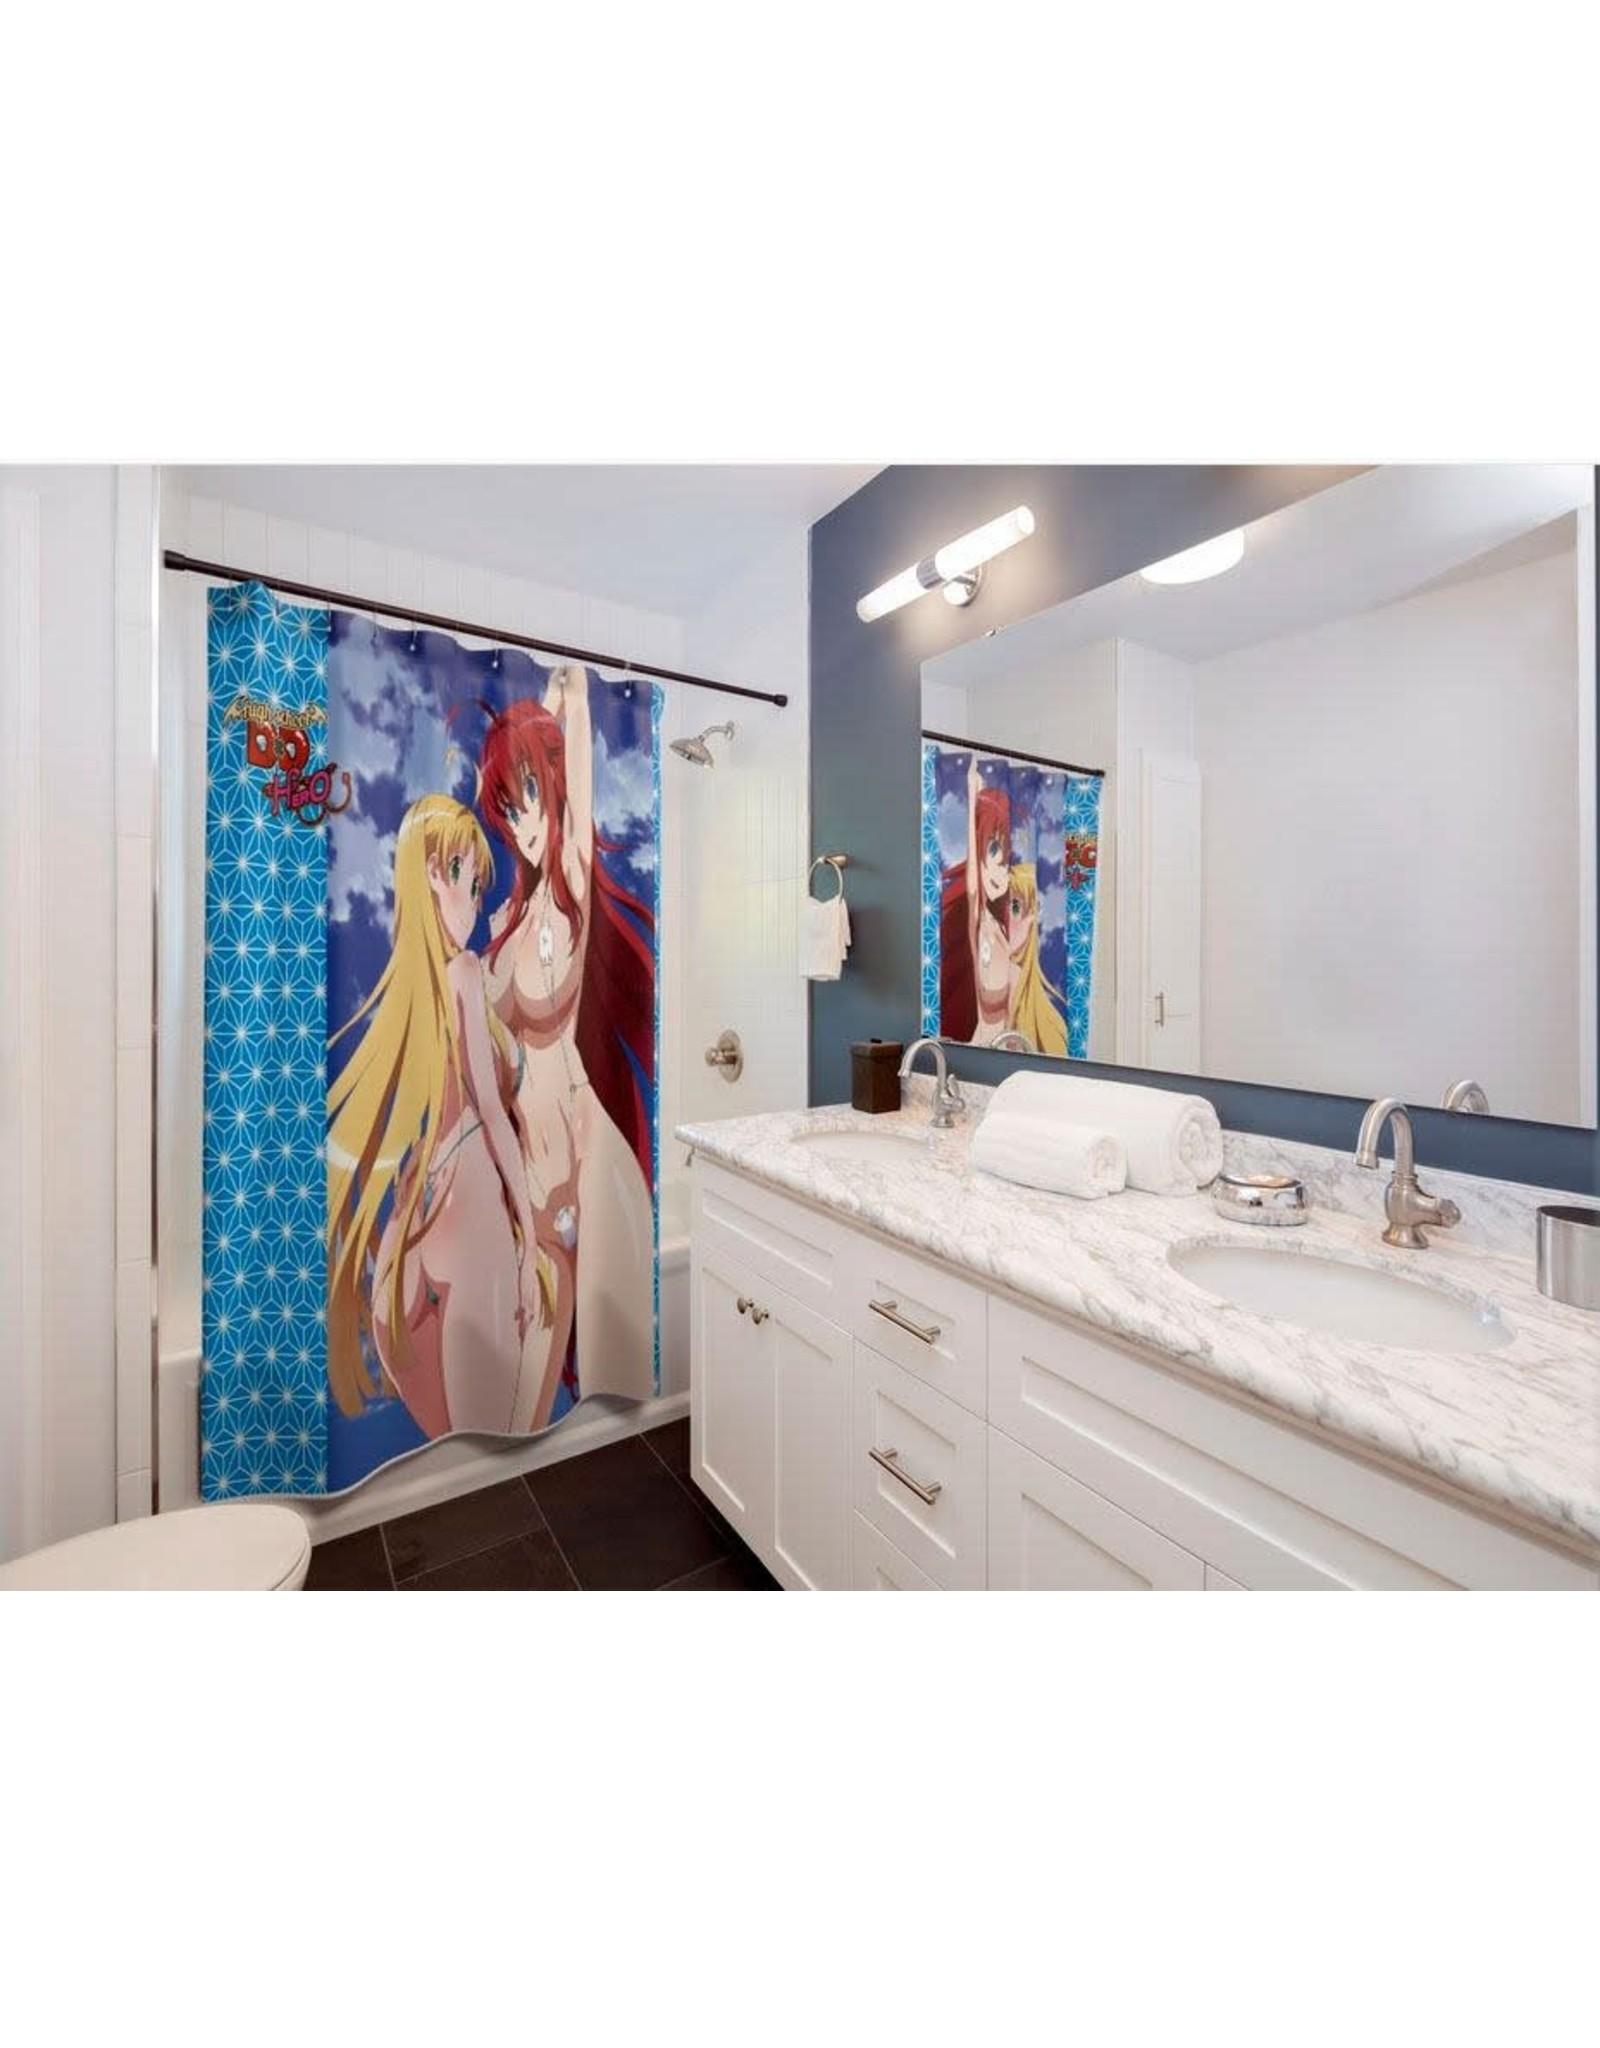 Highschool DxD Hero Shower Curtain - Rias & Asia - 180 x 180 cm